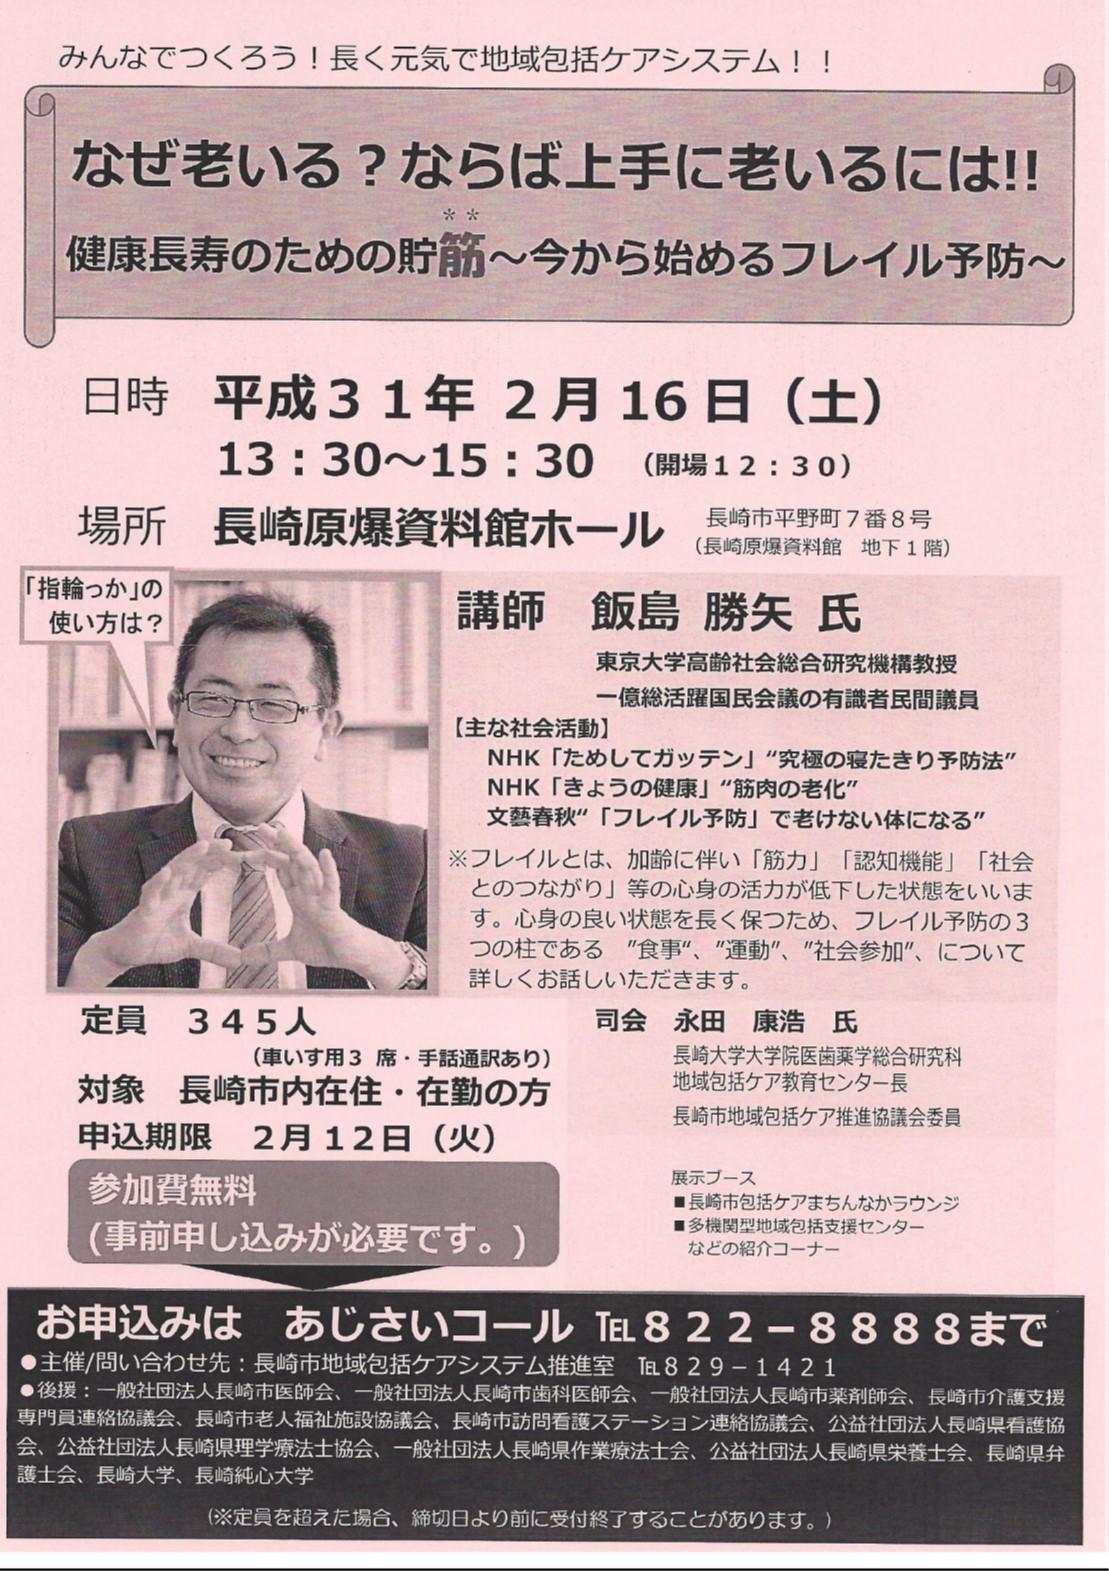 長崎市地域包括ケアシステム推進室主催研修会 @ 長崎原爆資料館ホール